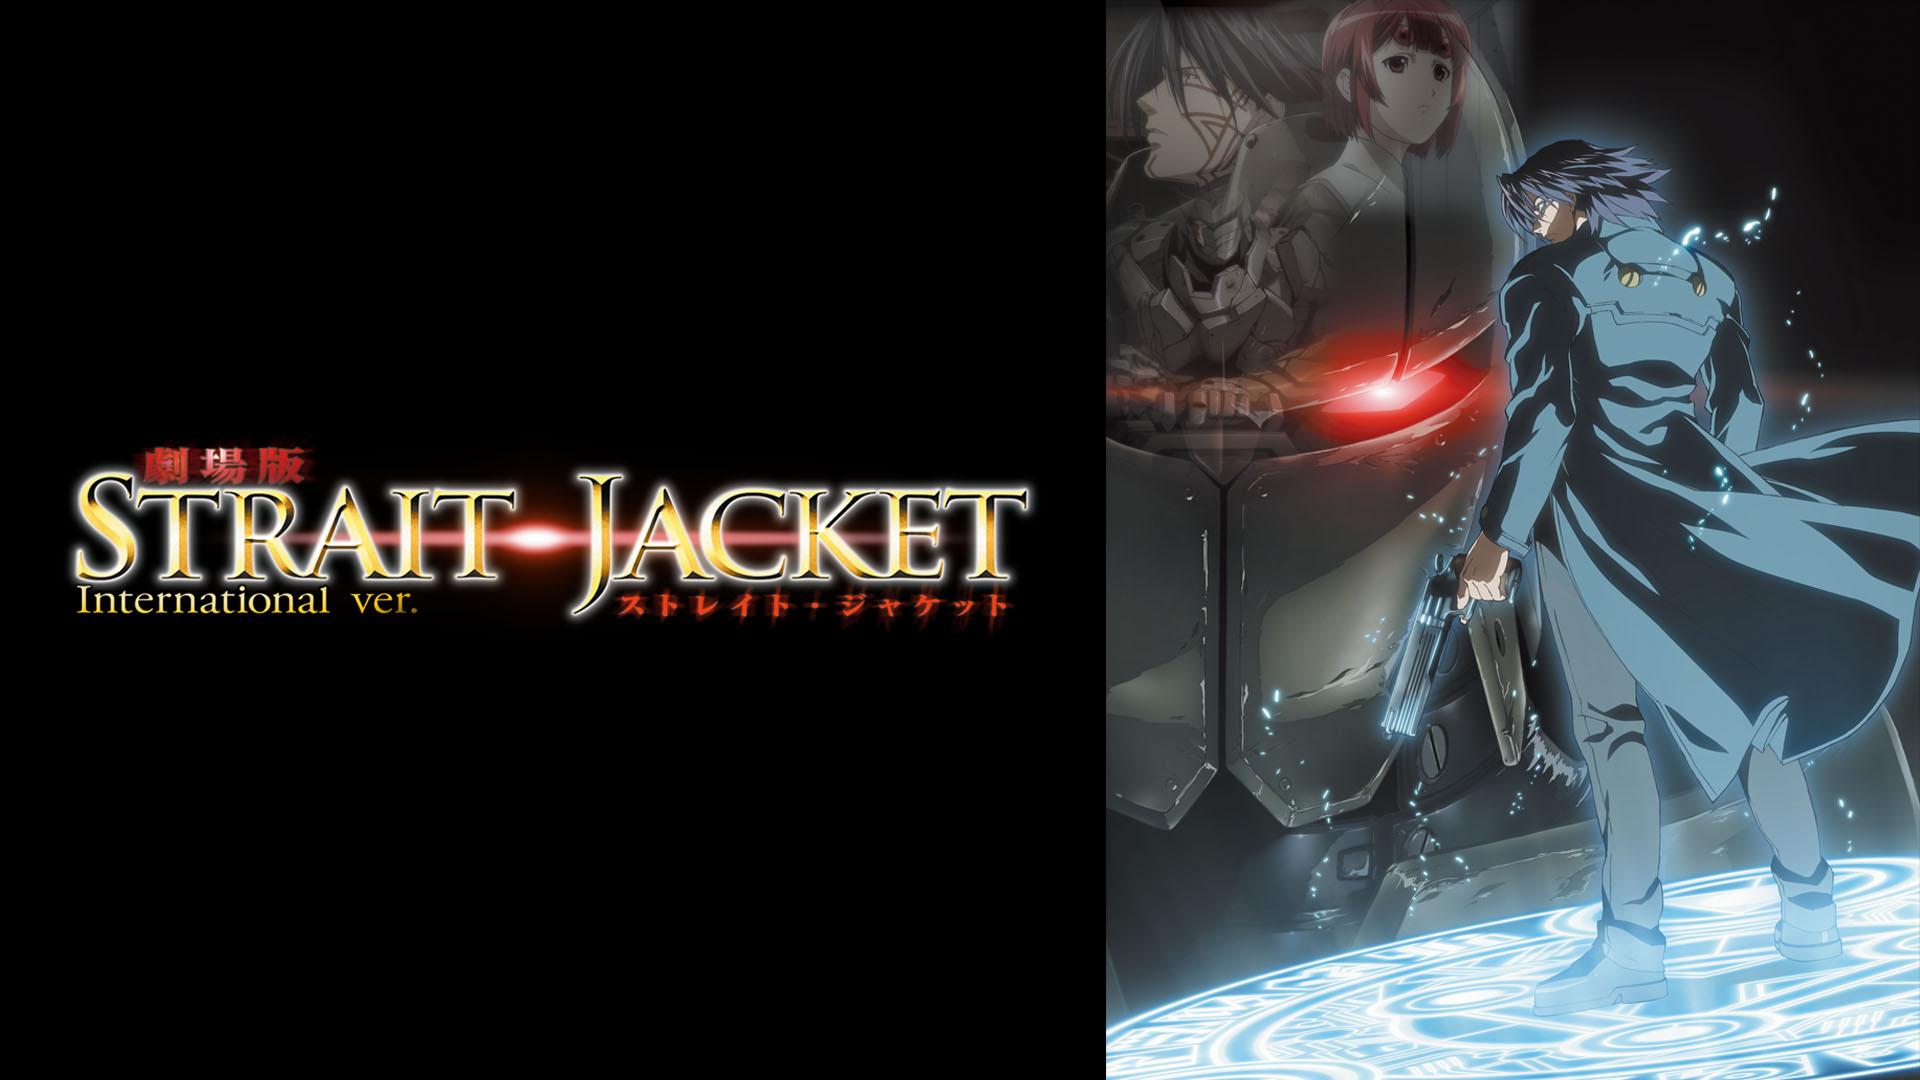 劇場版Strait Jacket